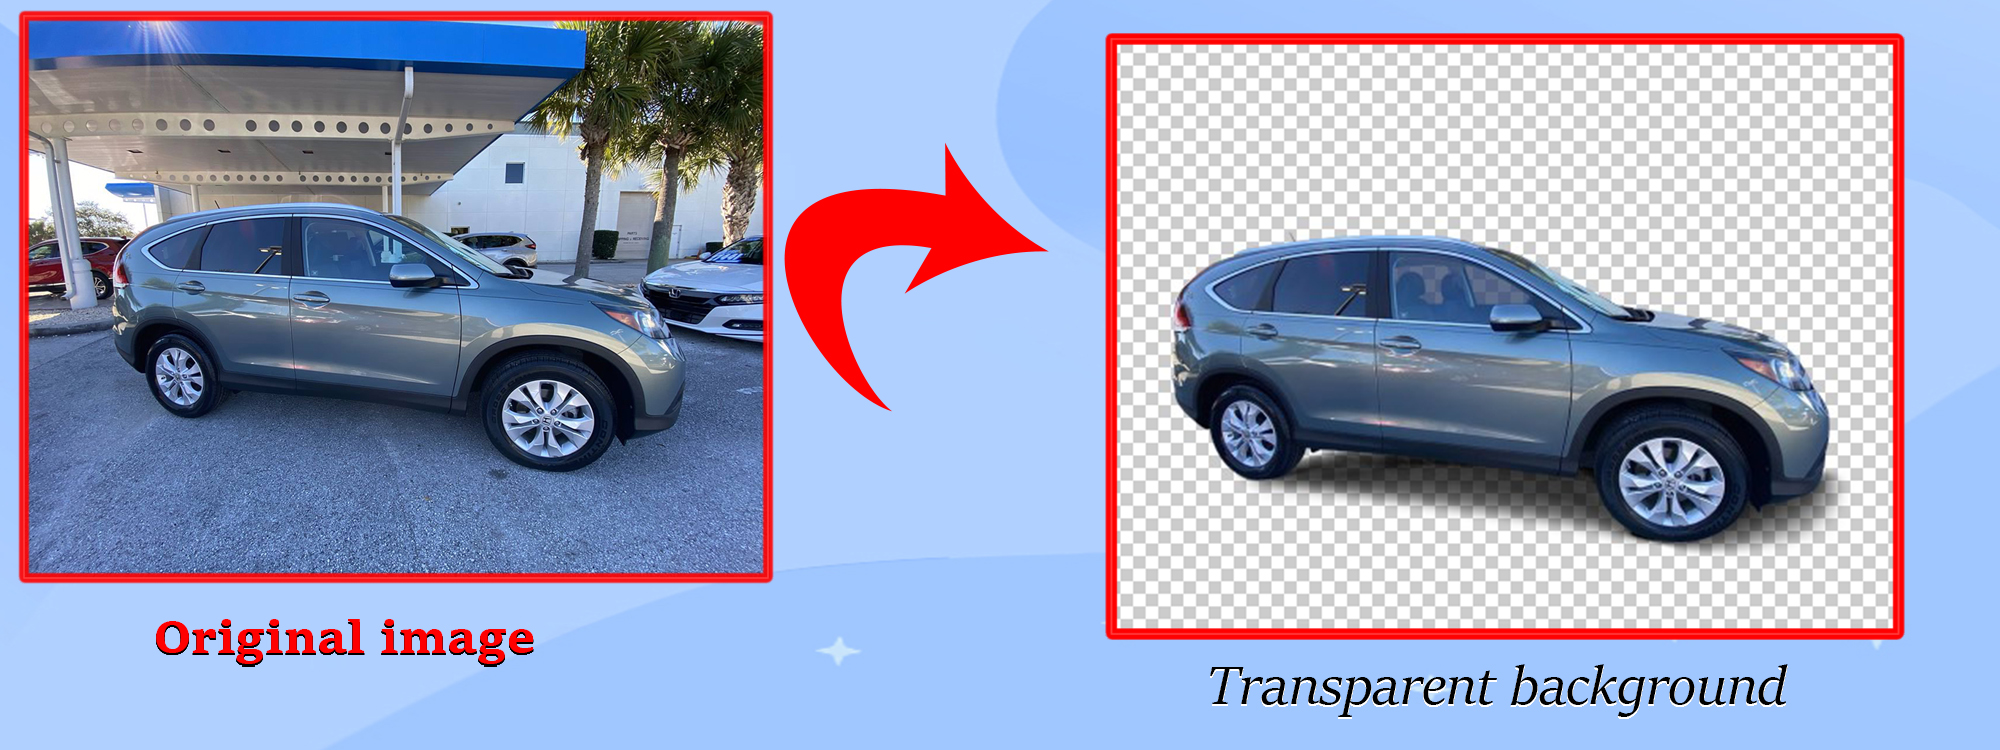 car transparent background-car pics editing